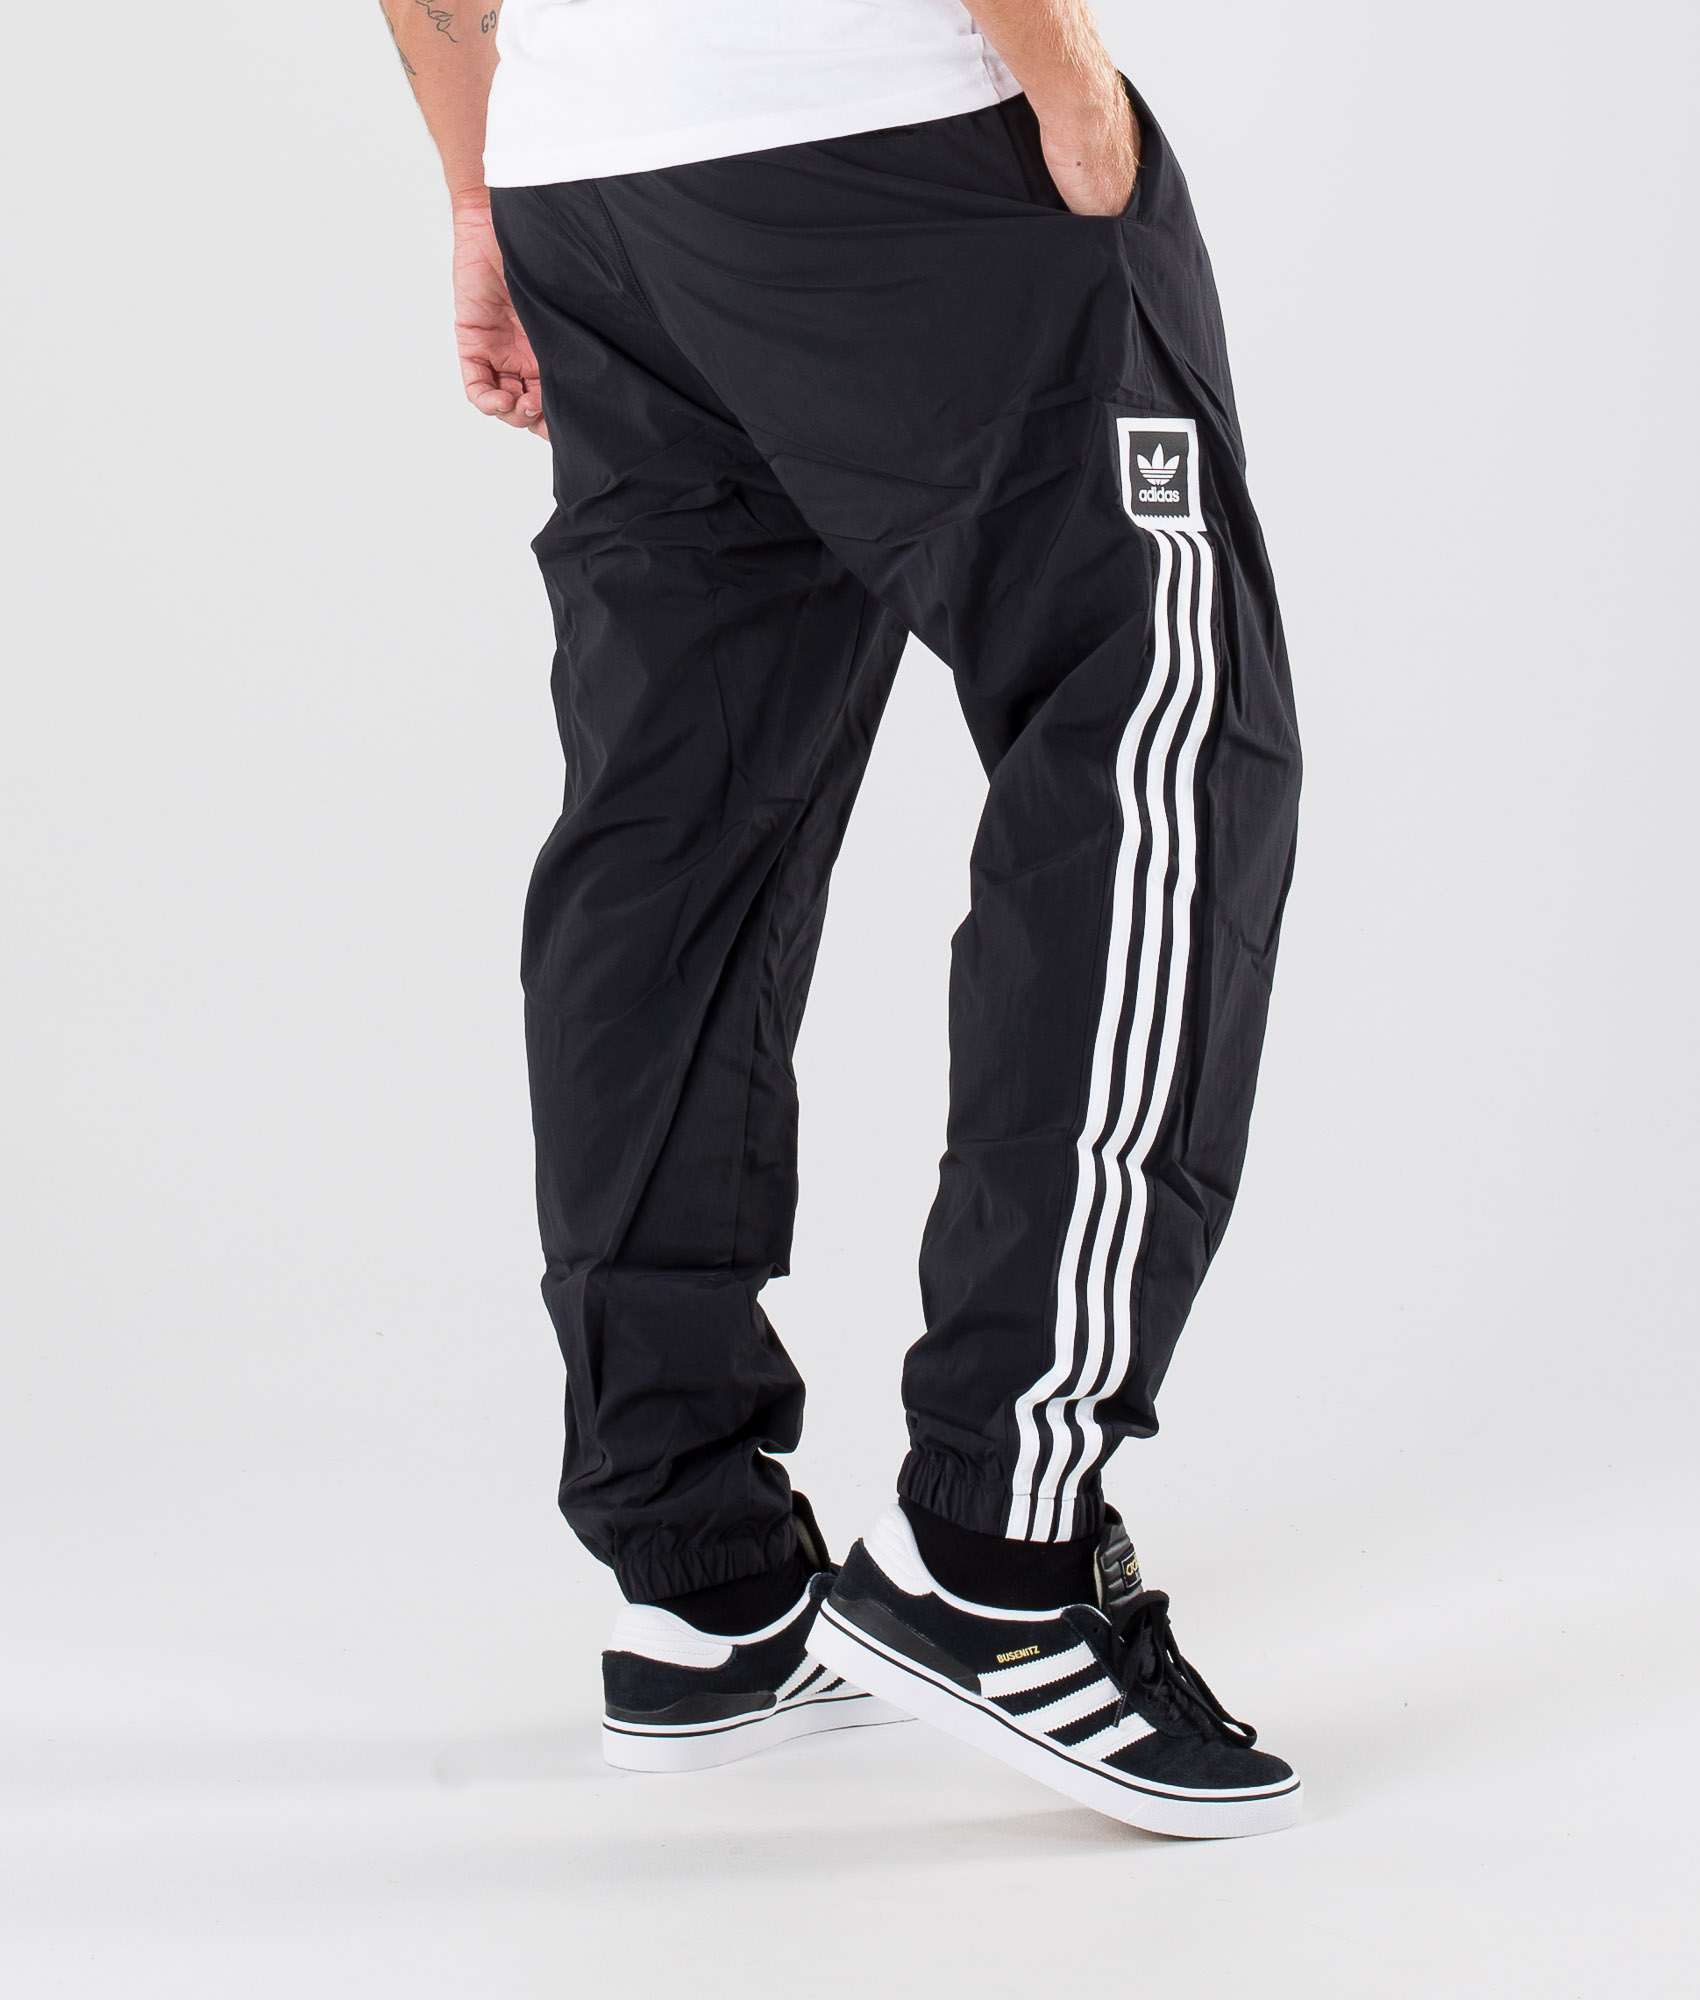 Adidas Skateboarding Tech Sweatpant Bukser BlackWhite